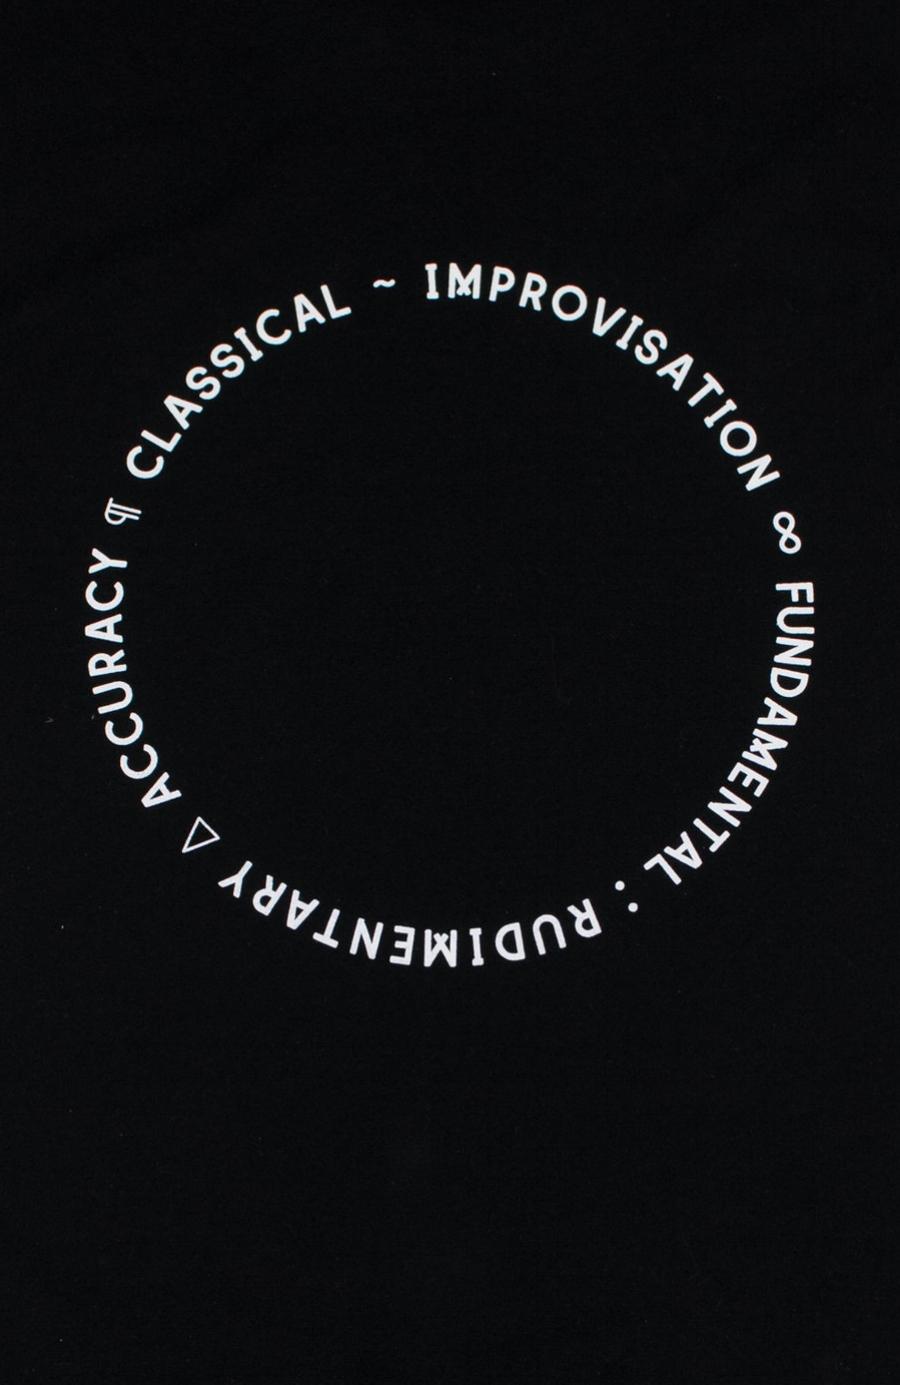 uniforms_circle.jpg